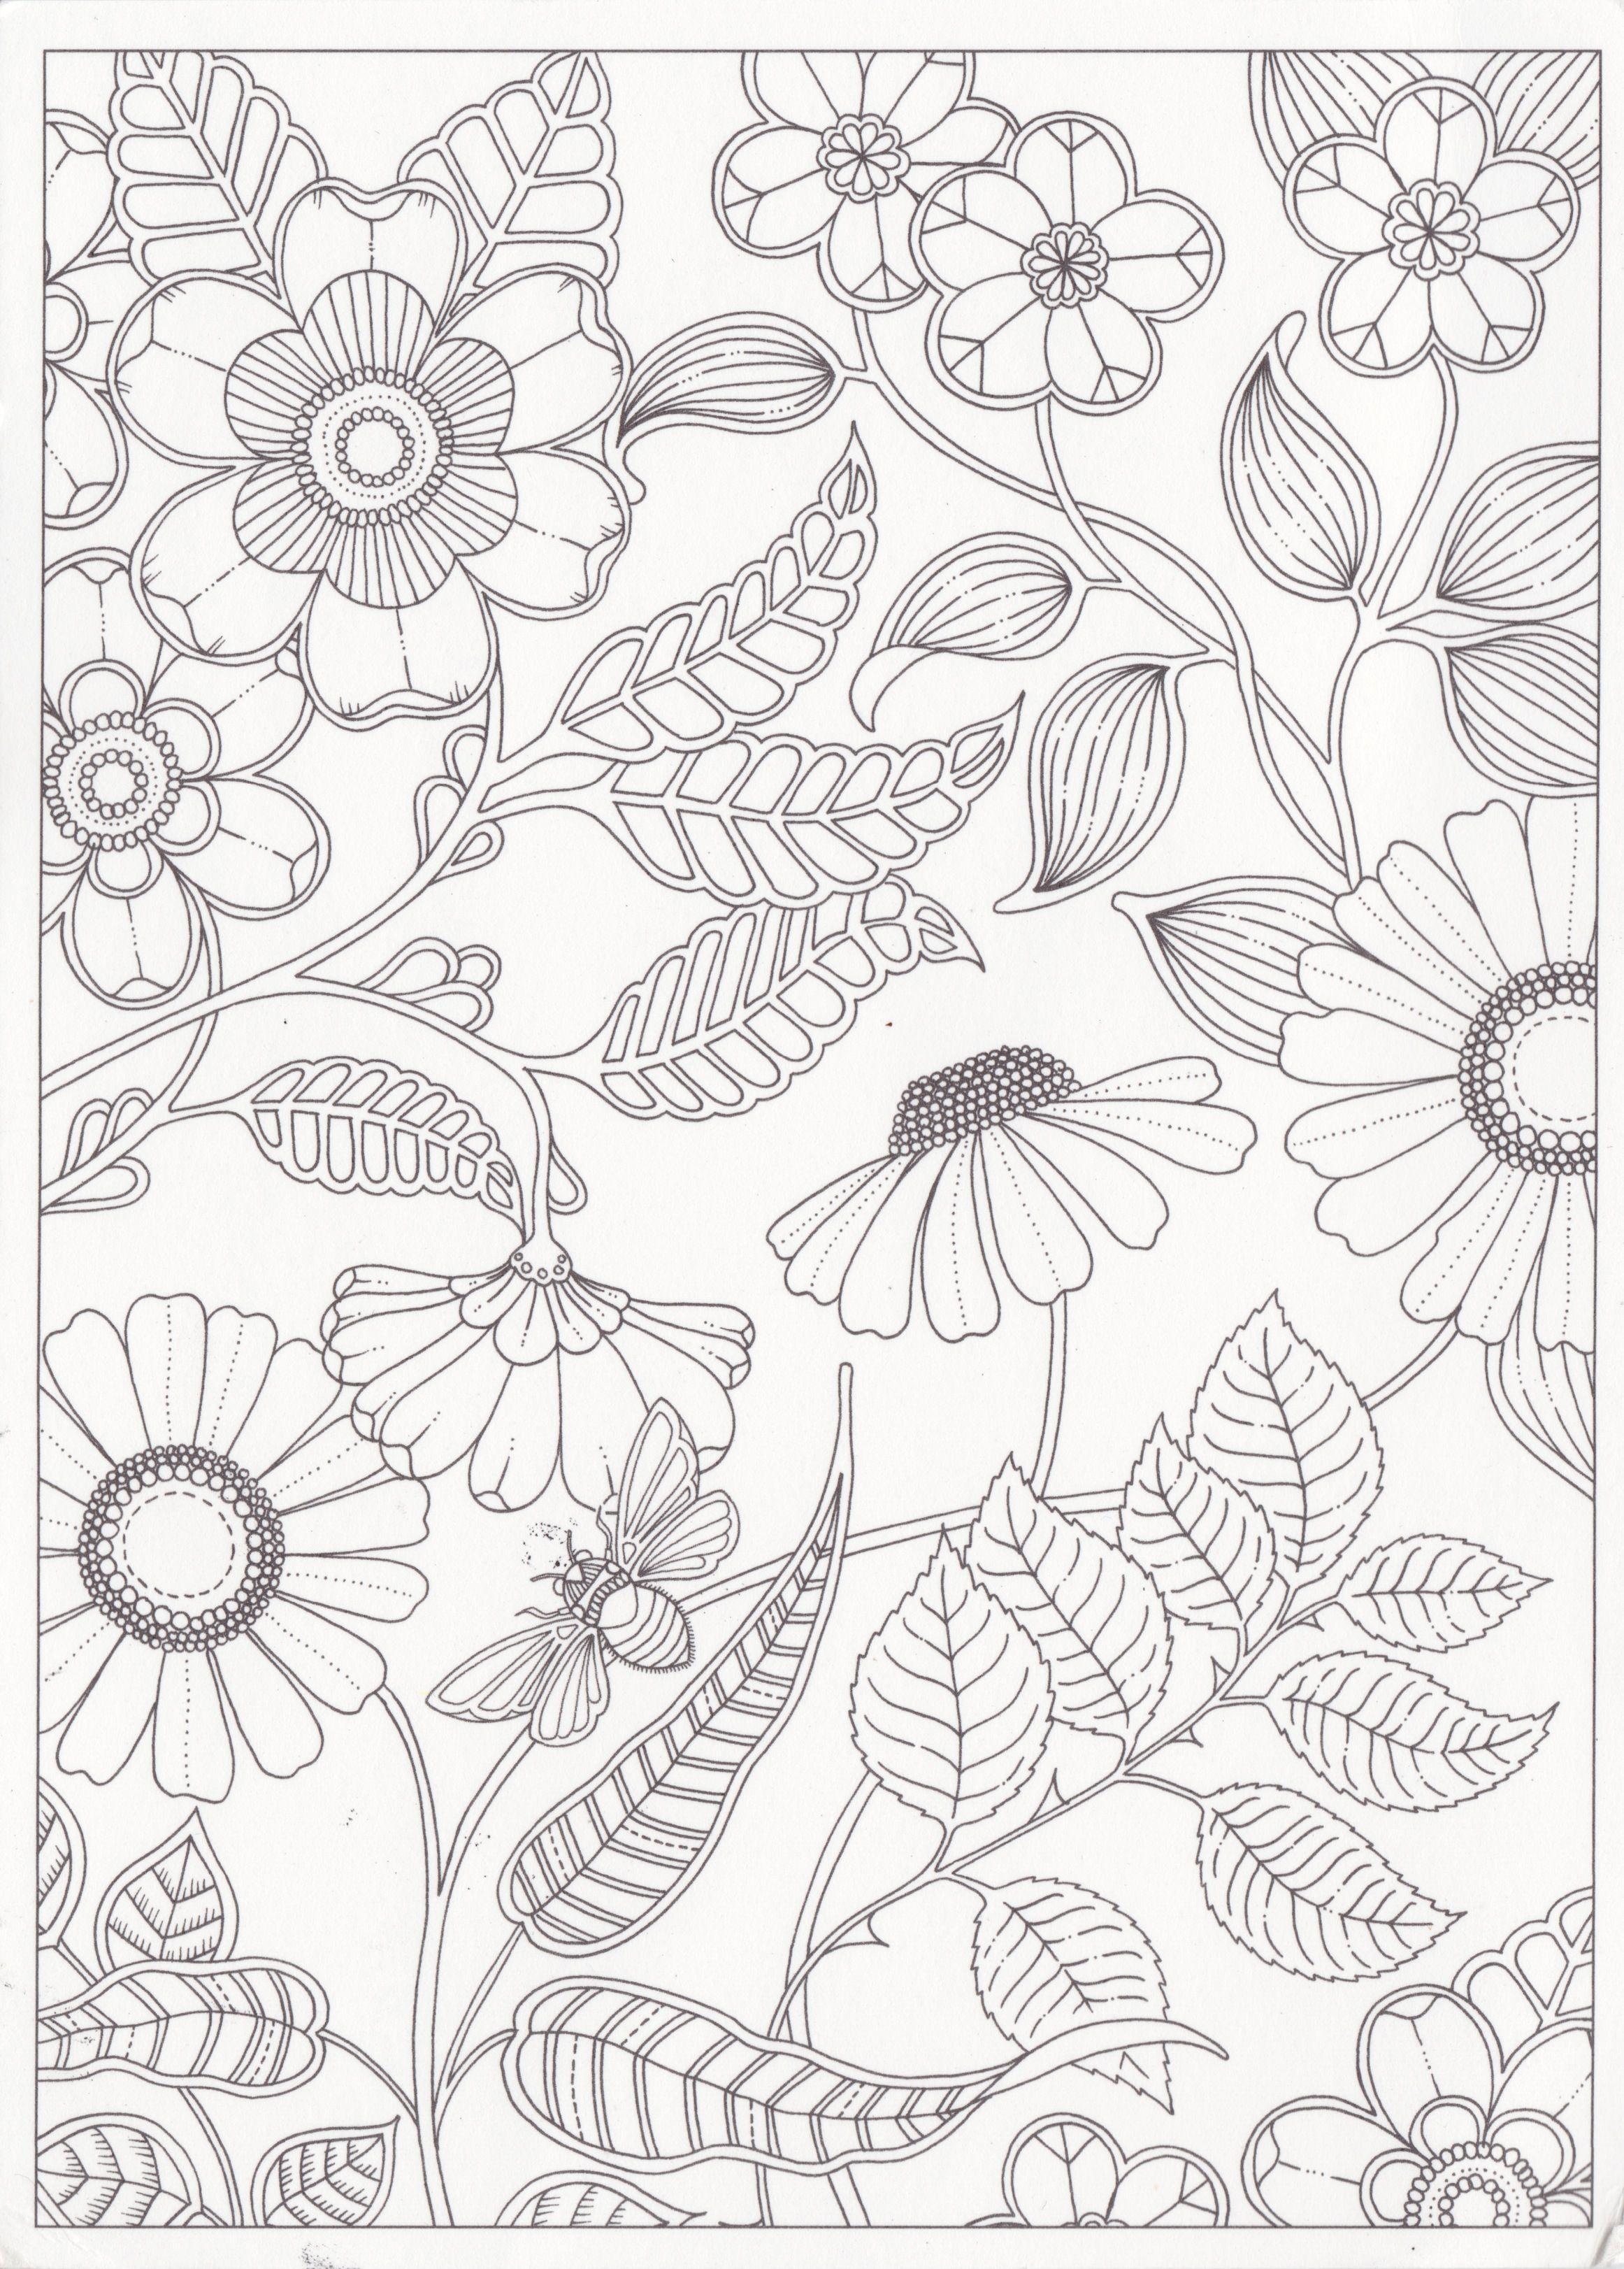 Garden Coloring Pages Flower Coloring Pages Secret Garden Coloring Book